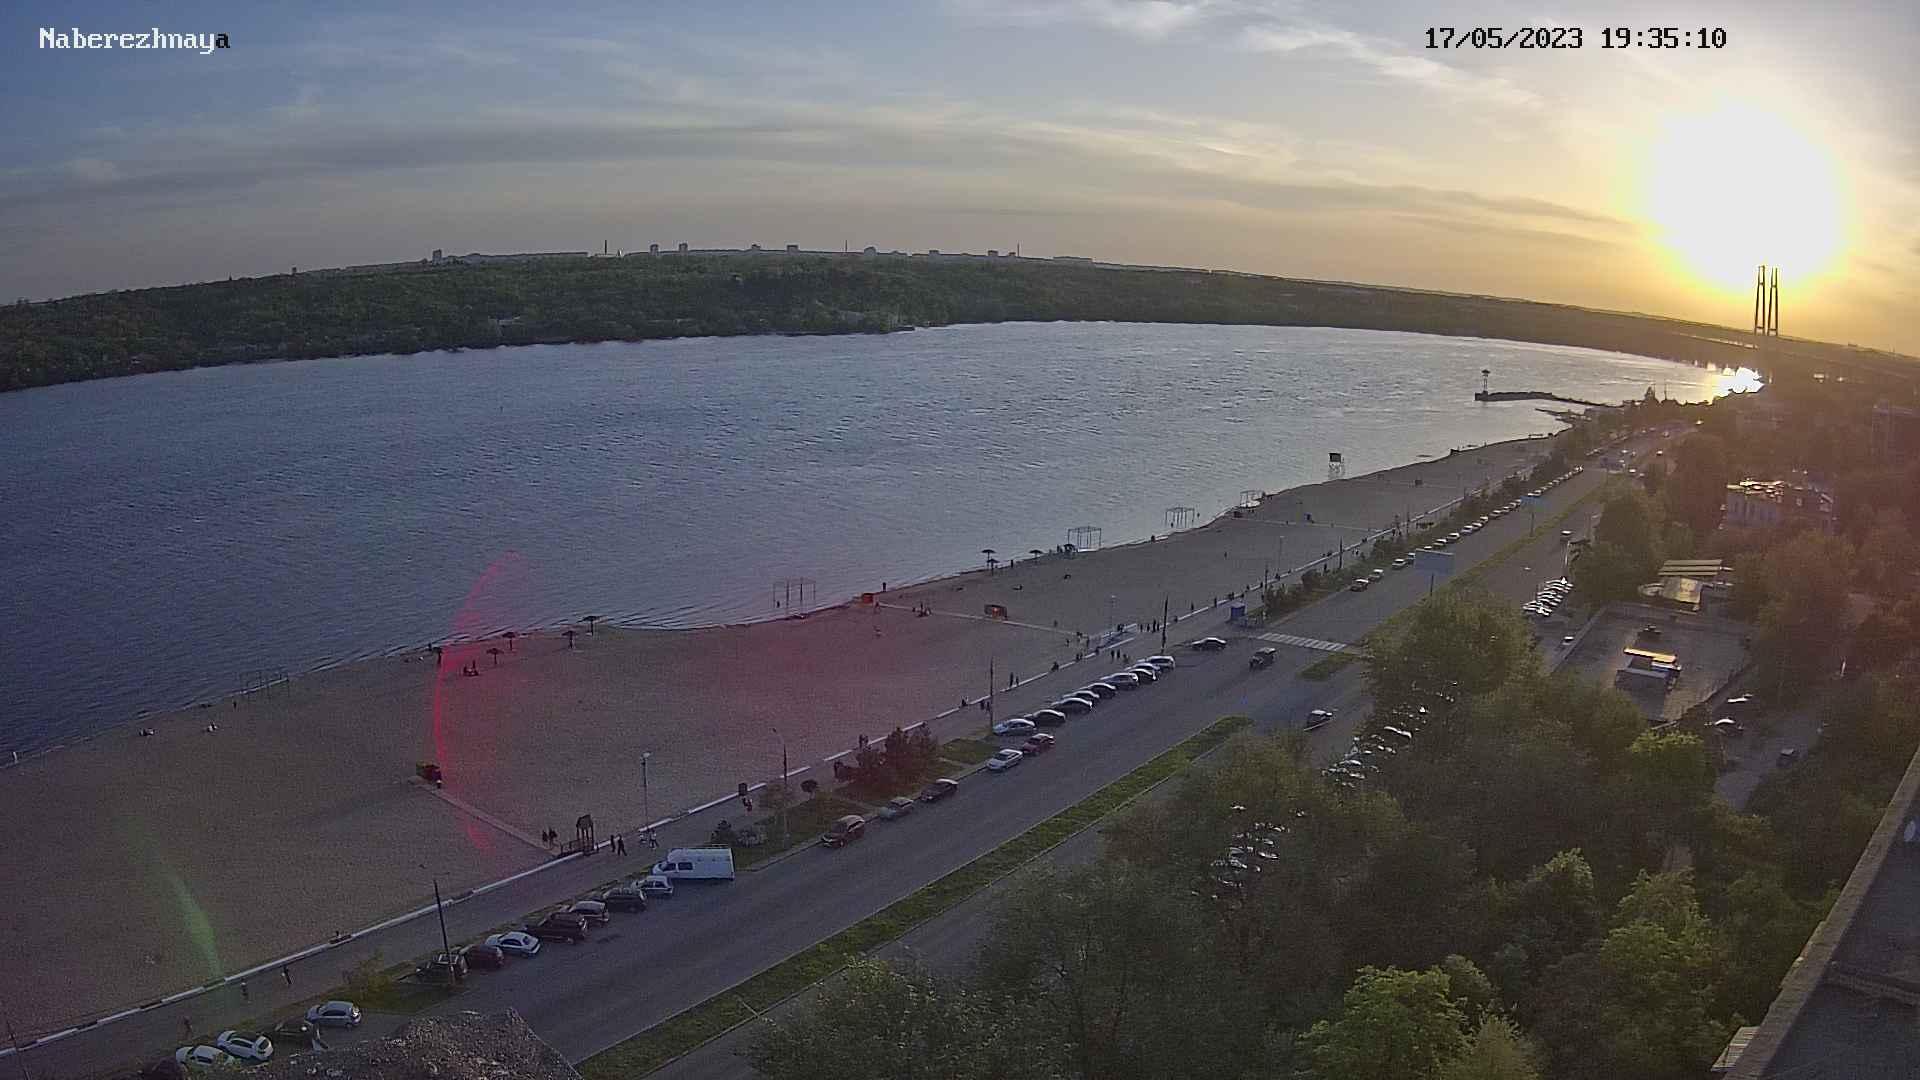 Webcam Voznesenka: Набережная, Центральный пляж